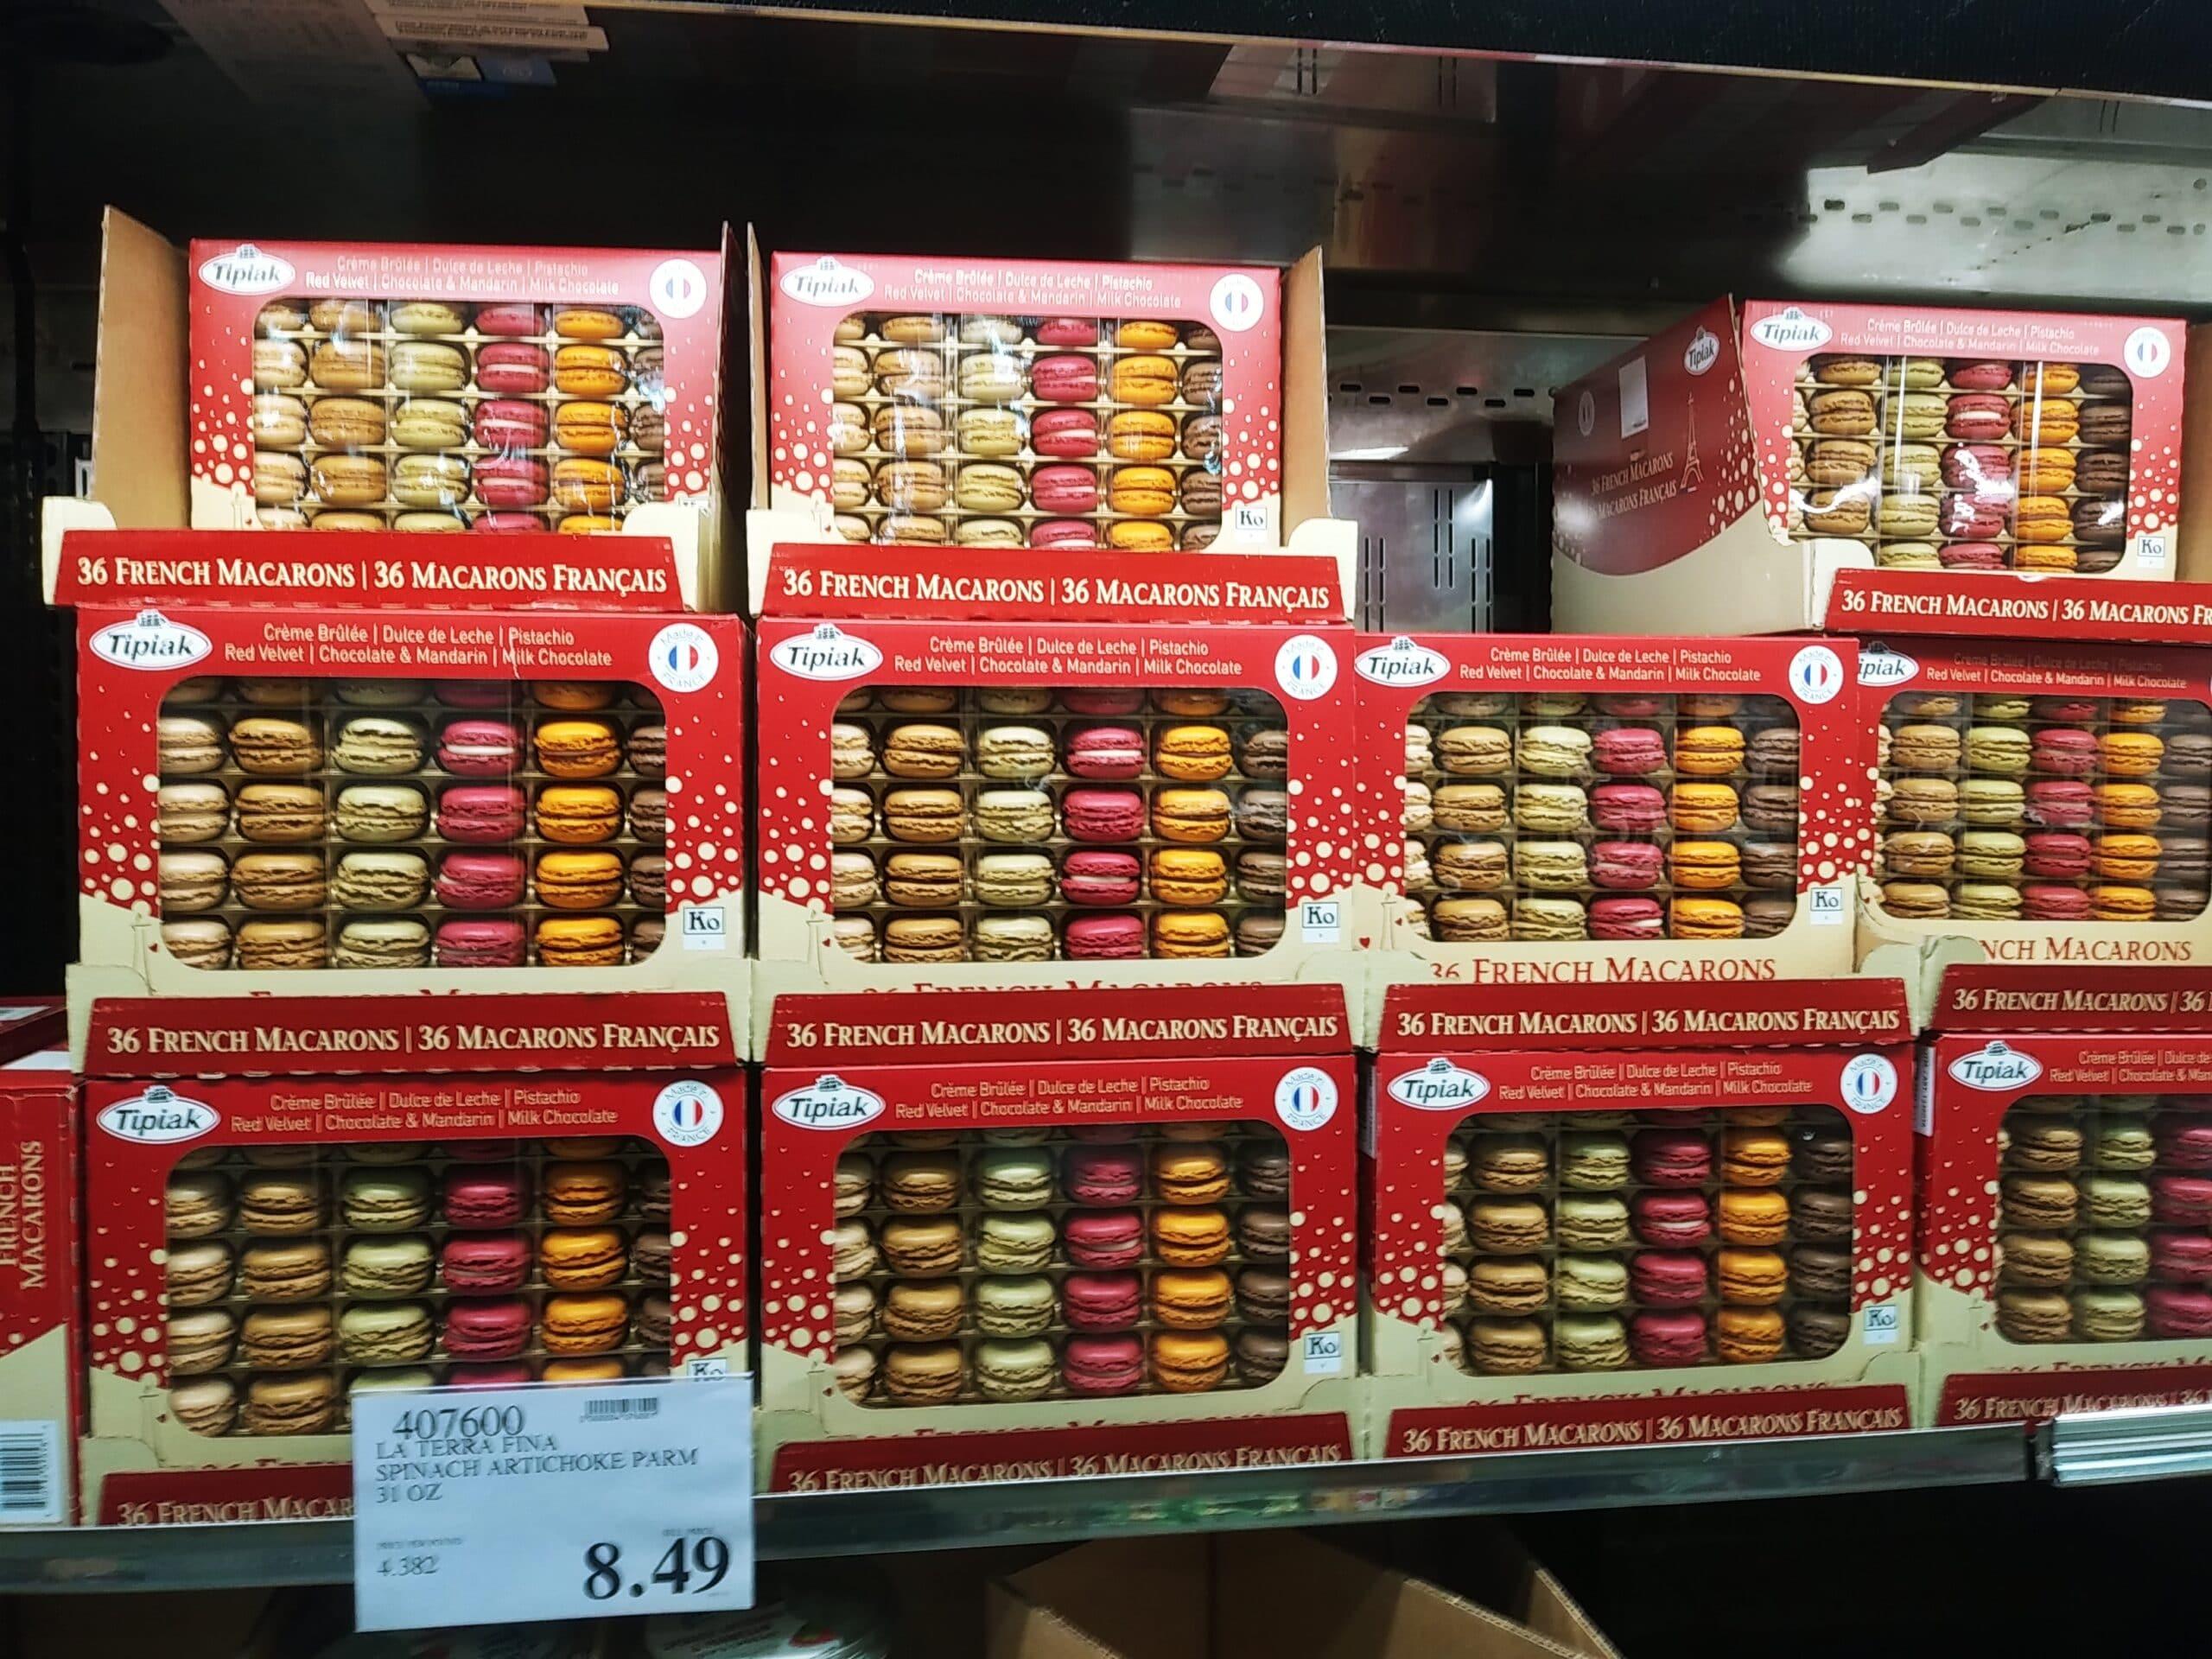 36 French Macarons $15.79